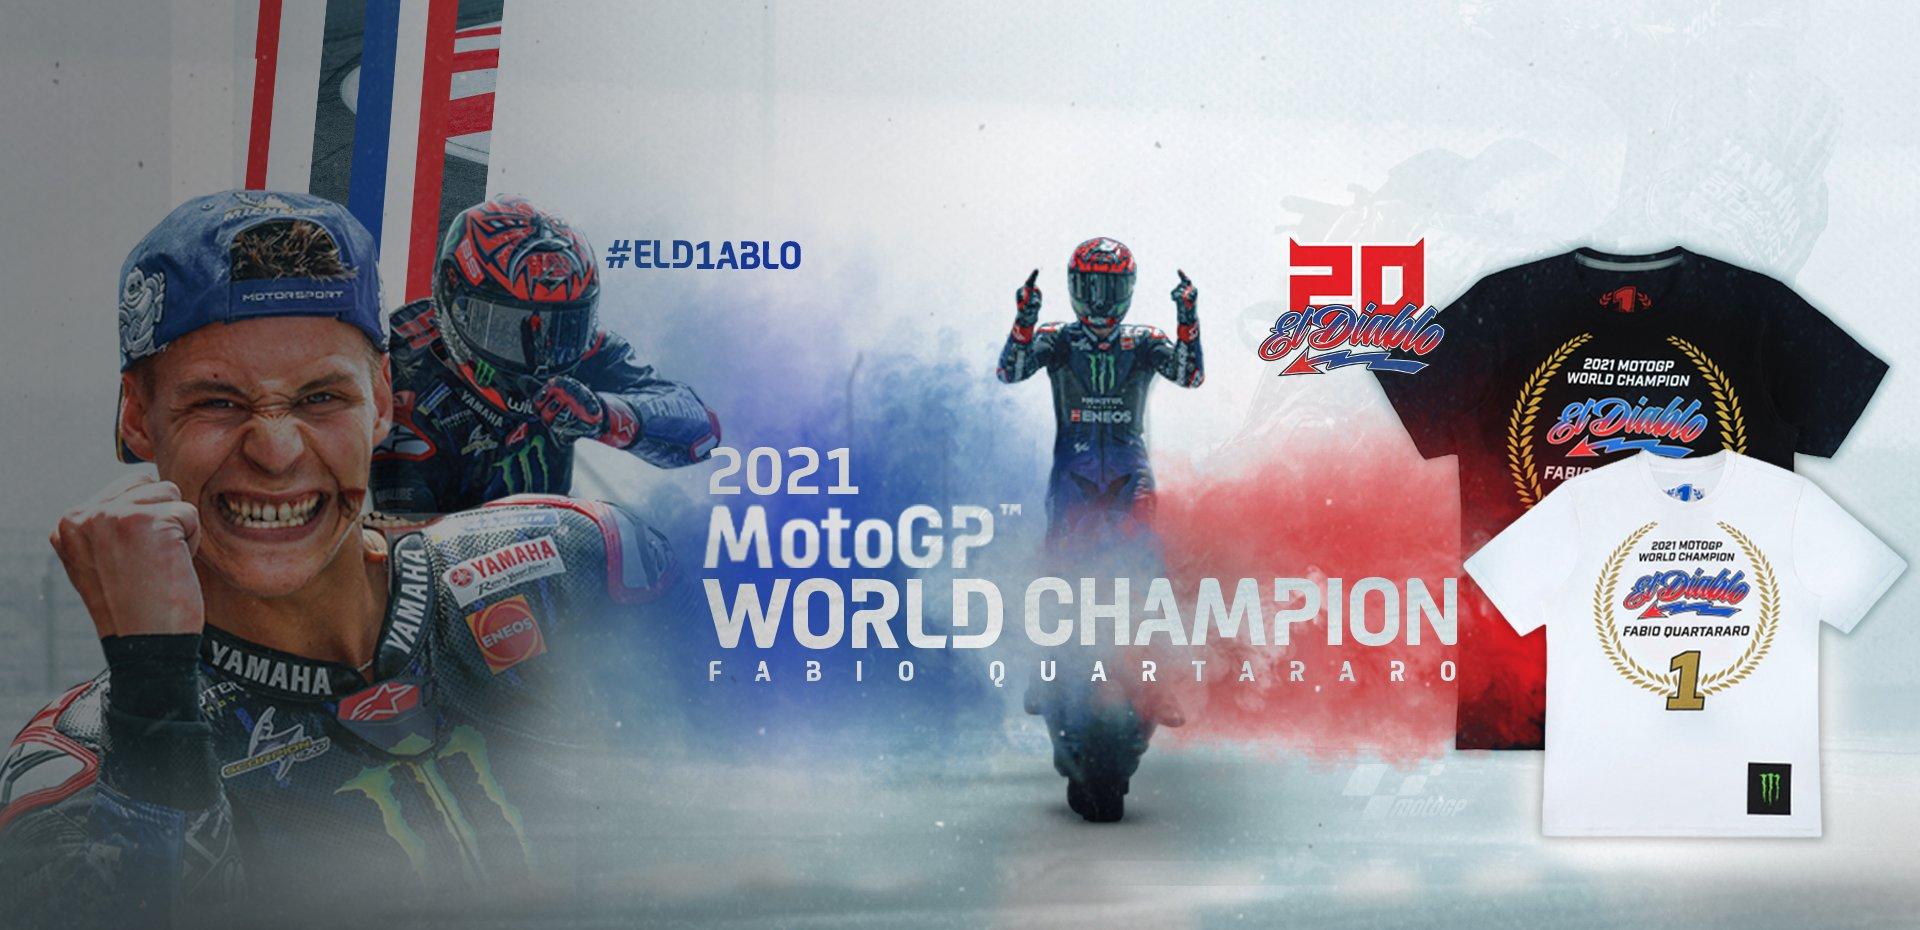 Fabio Quartararo World Champion 2021 T-shirt